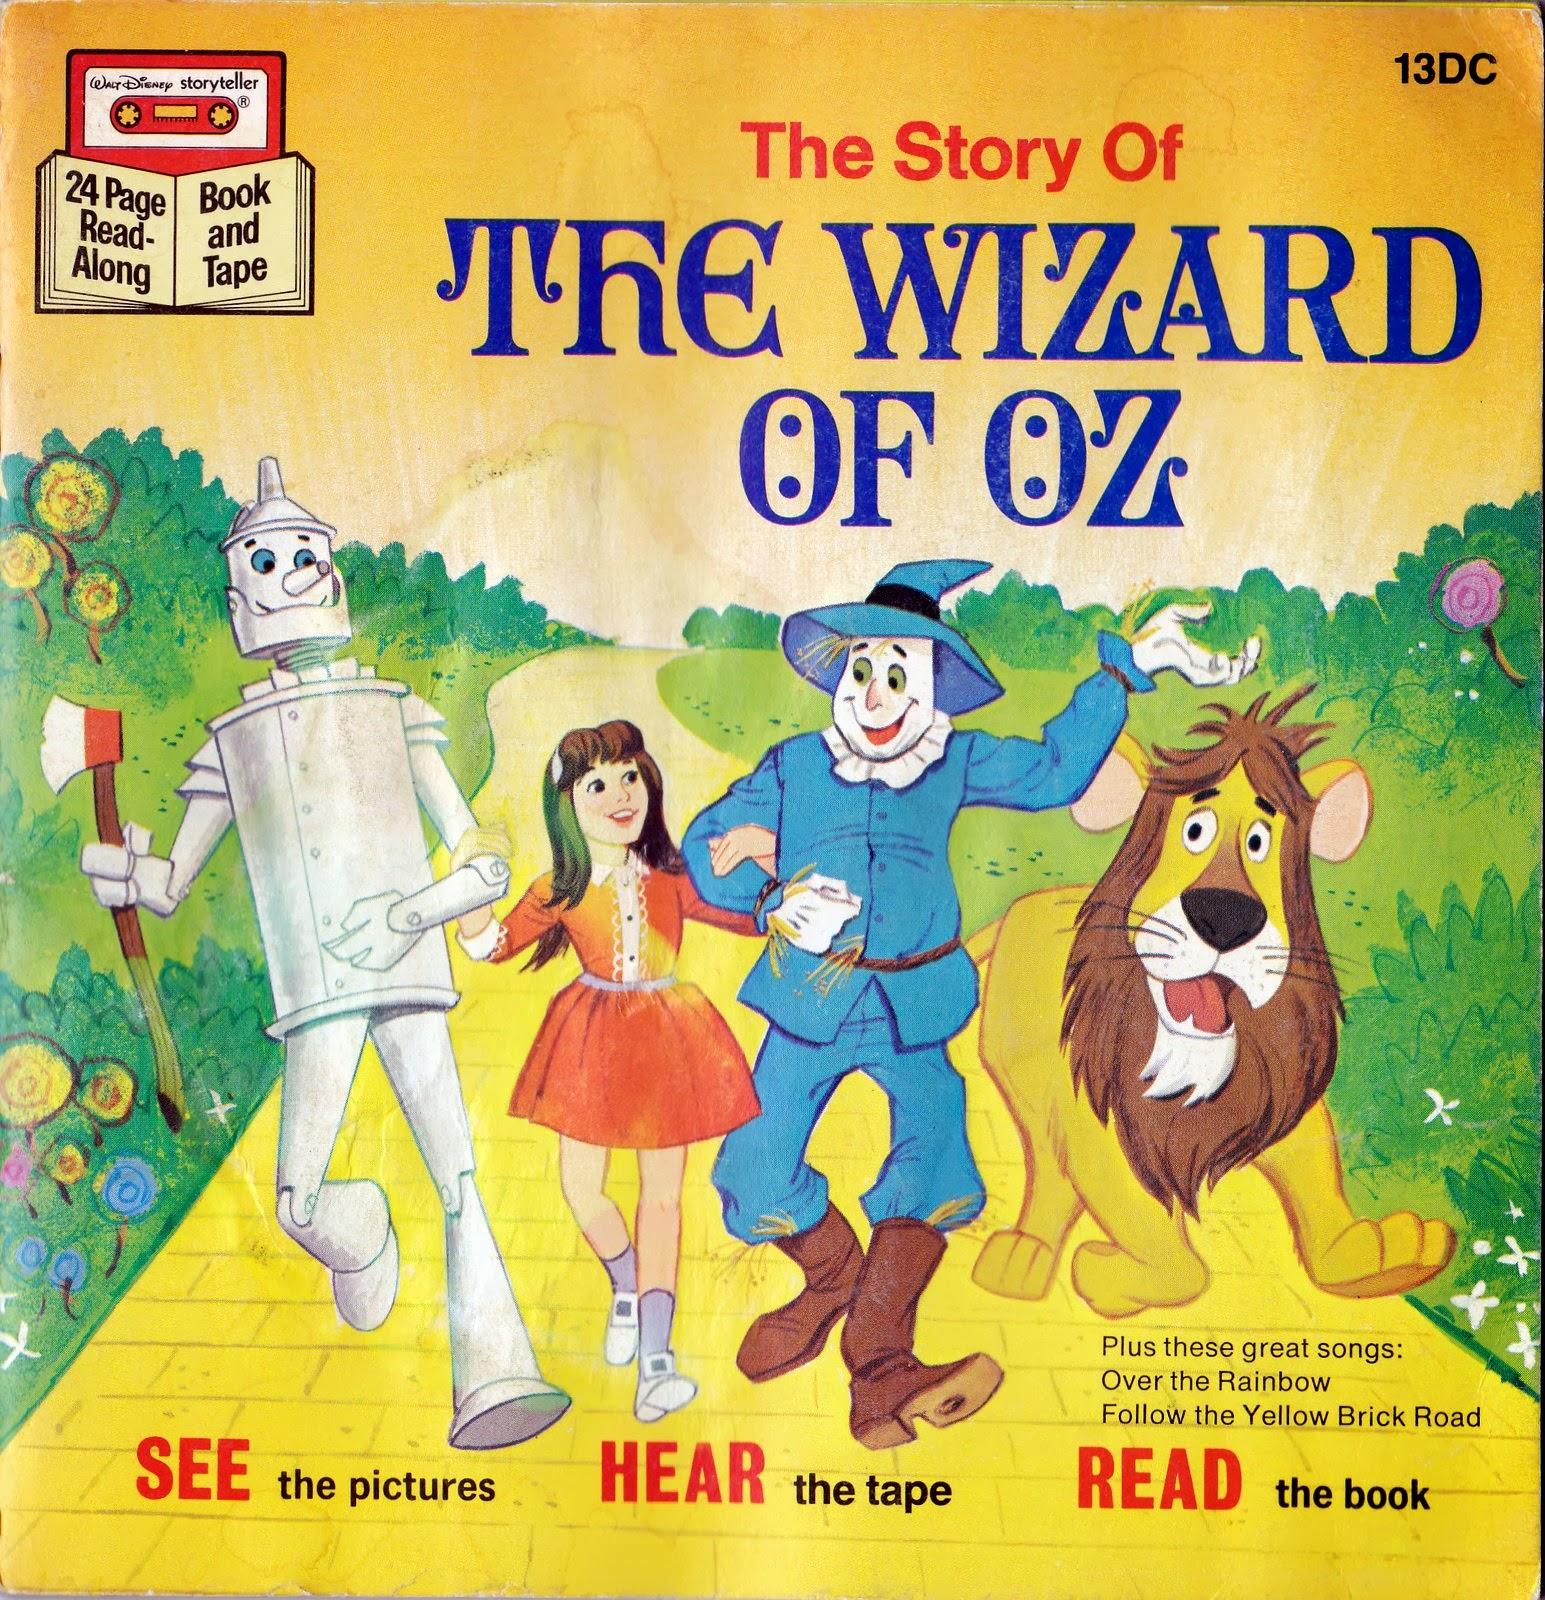 The Wonderful Wizard of Oz Summary